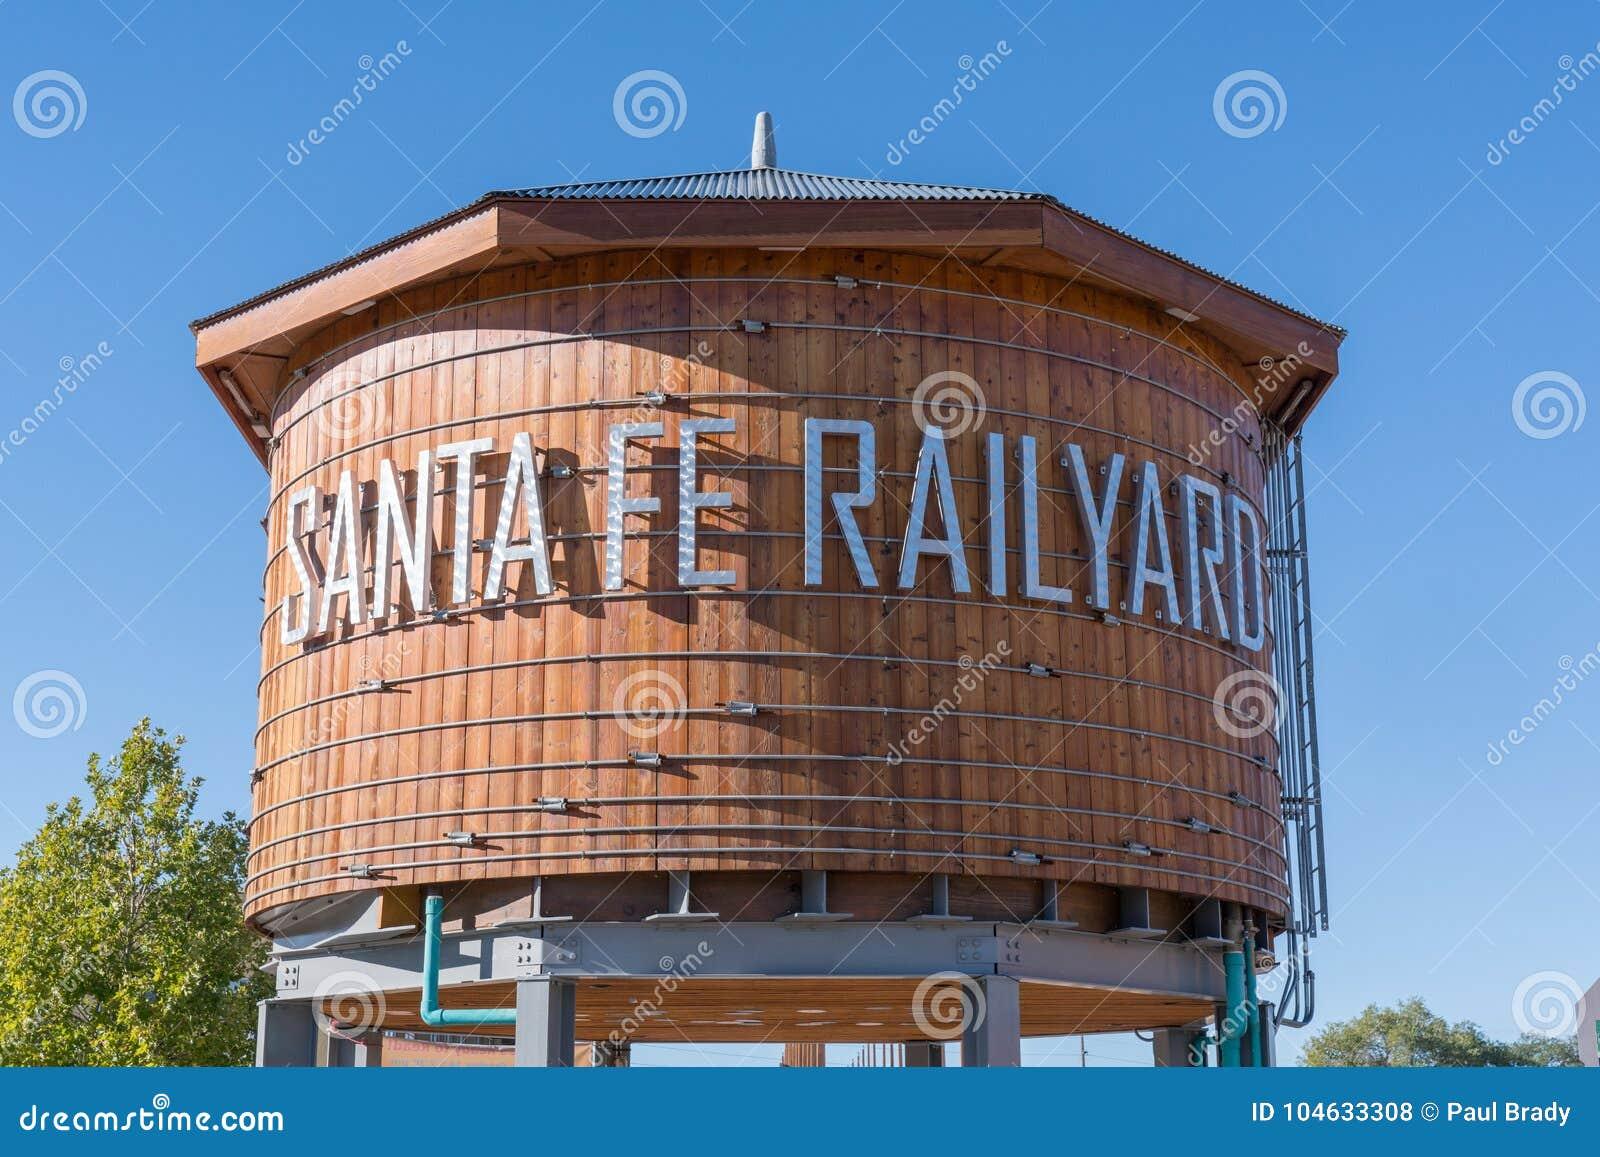 Download Santa Fe Railyard Water Tower Redactionele Stock Foto - Afbeelding bestaande uit building, teken: 104633308